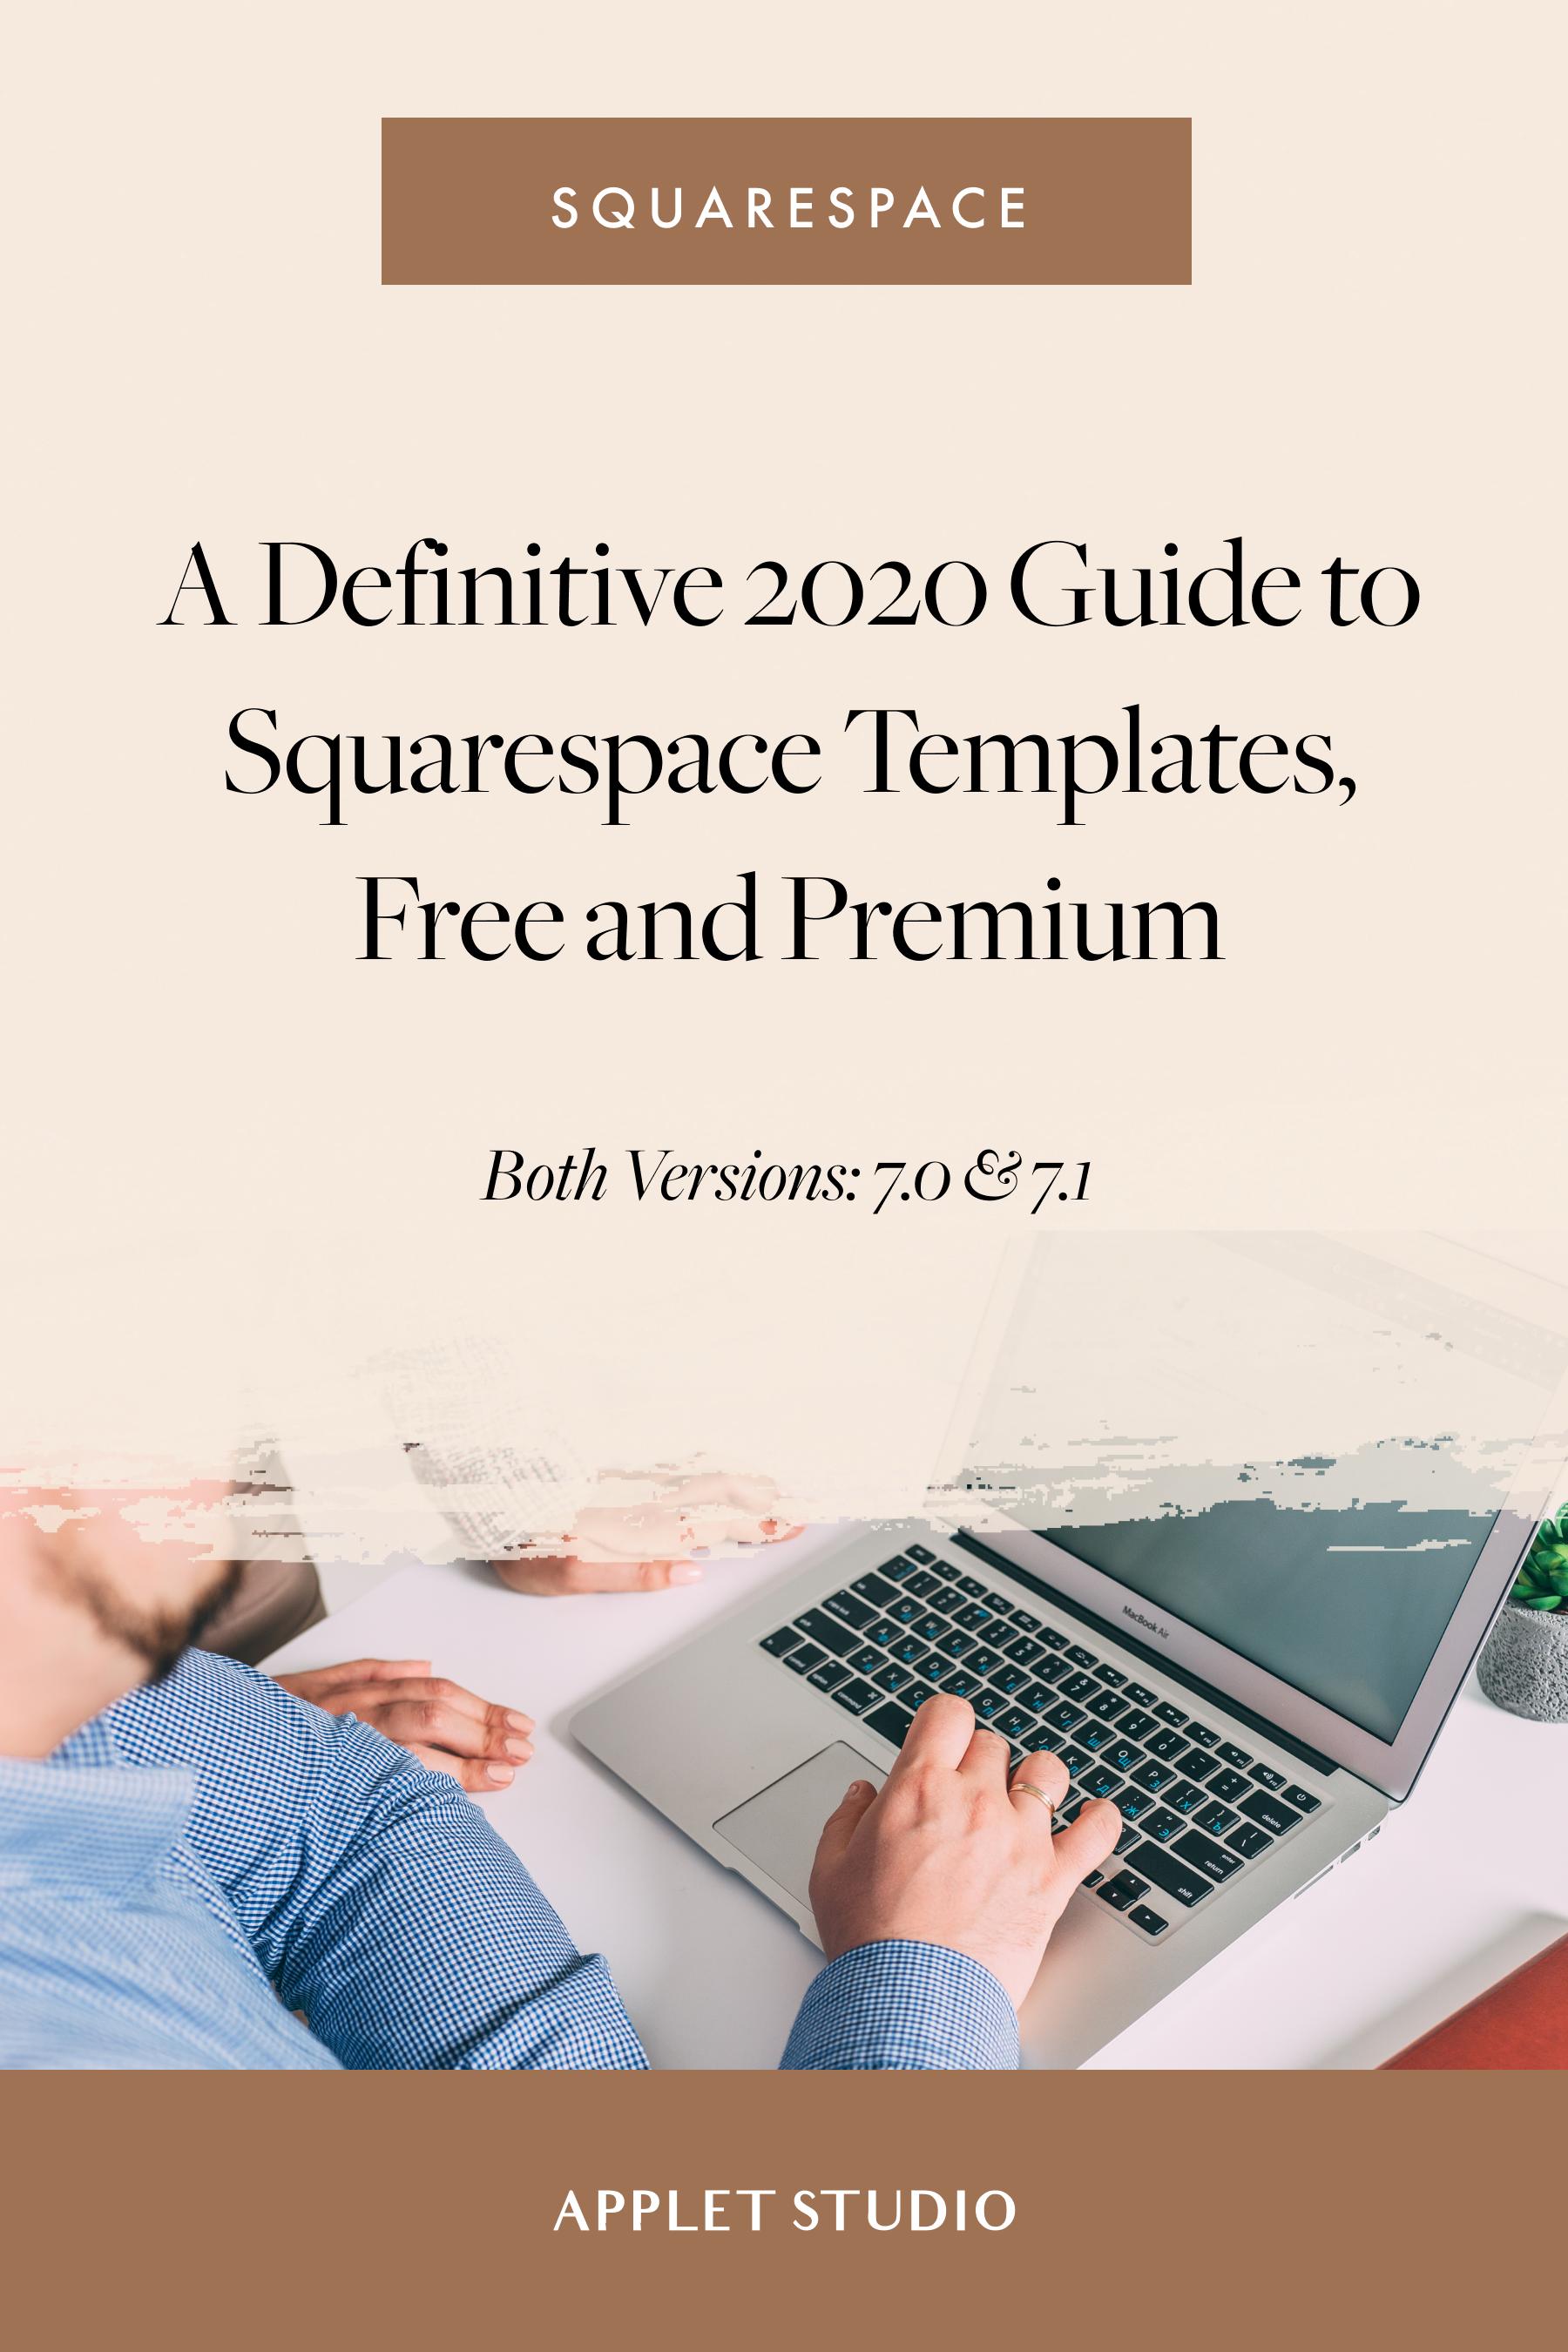 Squarespace Templates Explained Definitive 2020 Guide